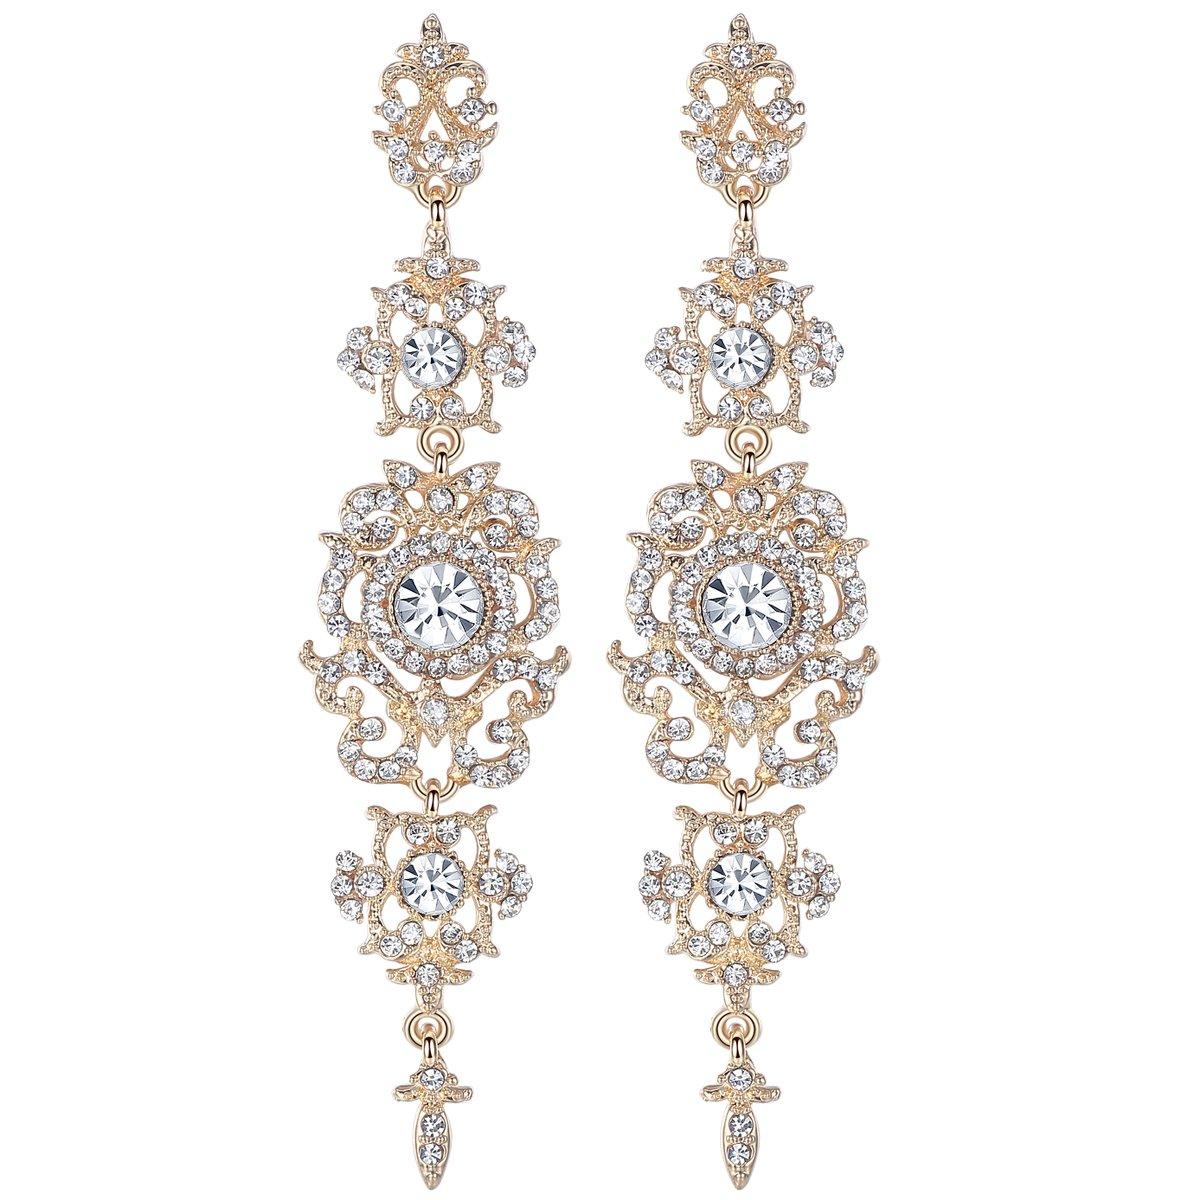 mecresh Gold Long Wedding Chandelier Austrian Crystal Earrings for Women Brides Bridesmaid